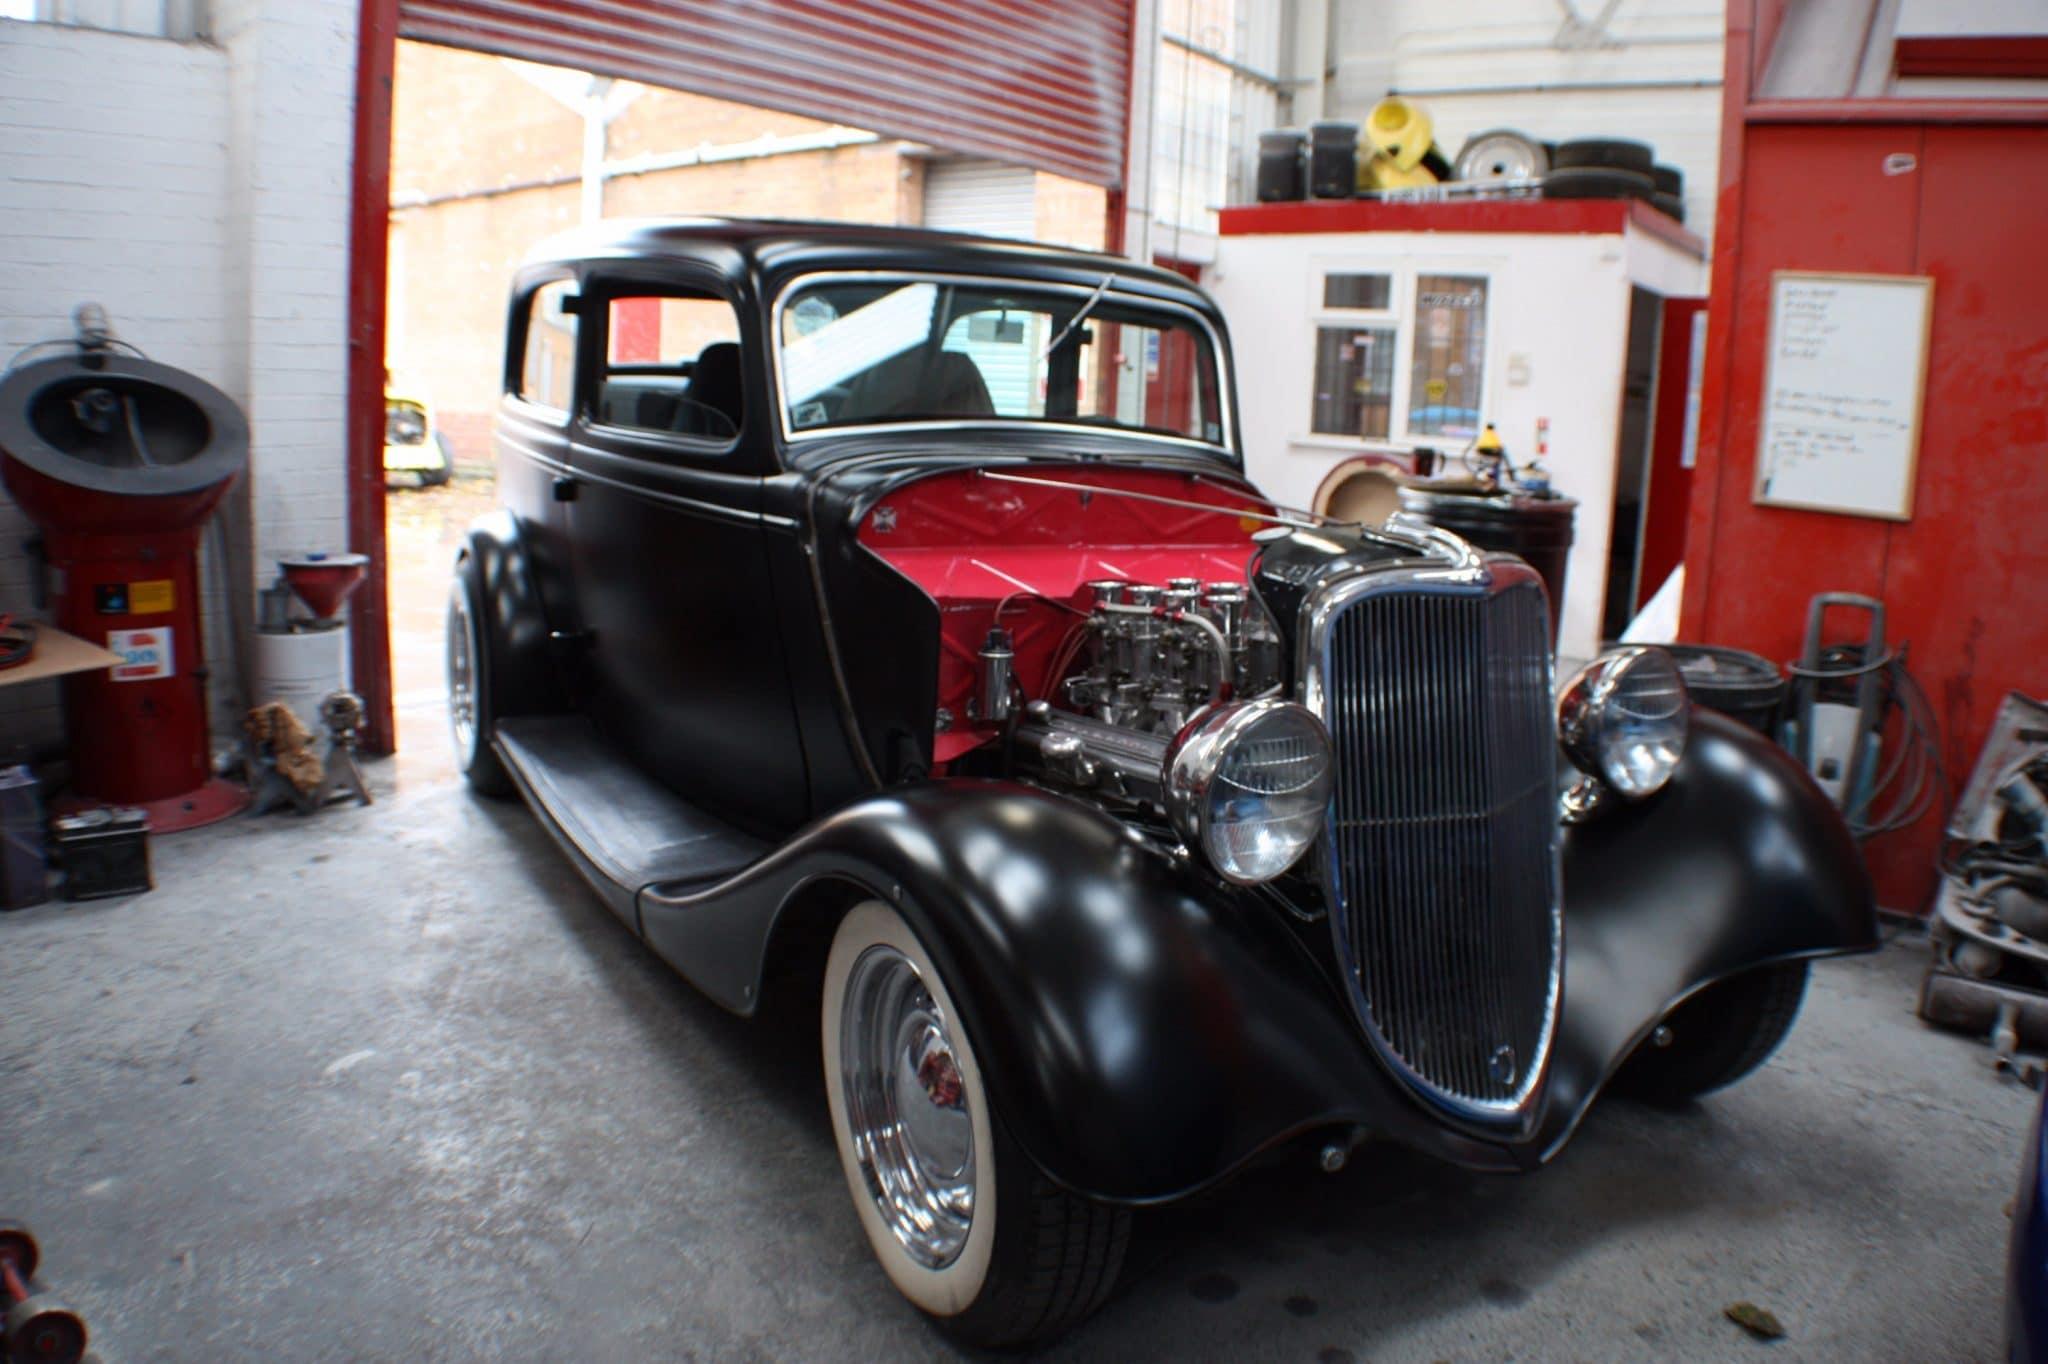 Rolls Royce engine exposed